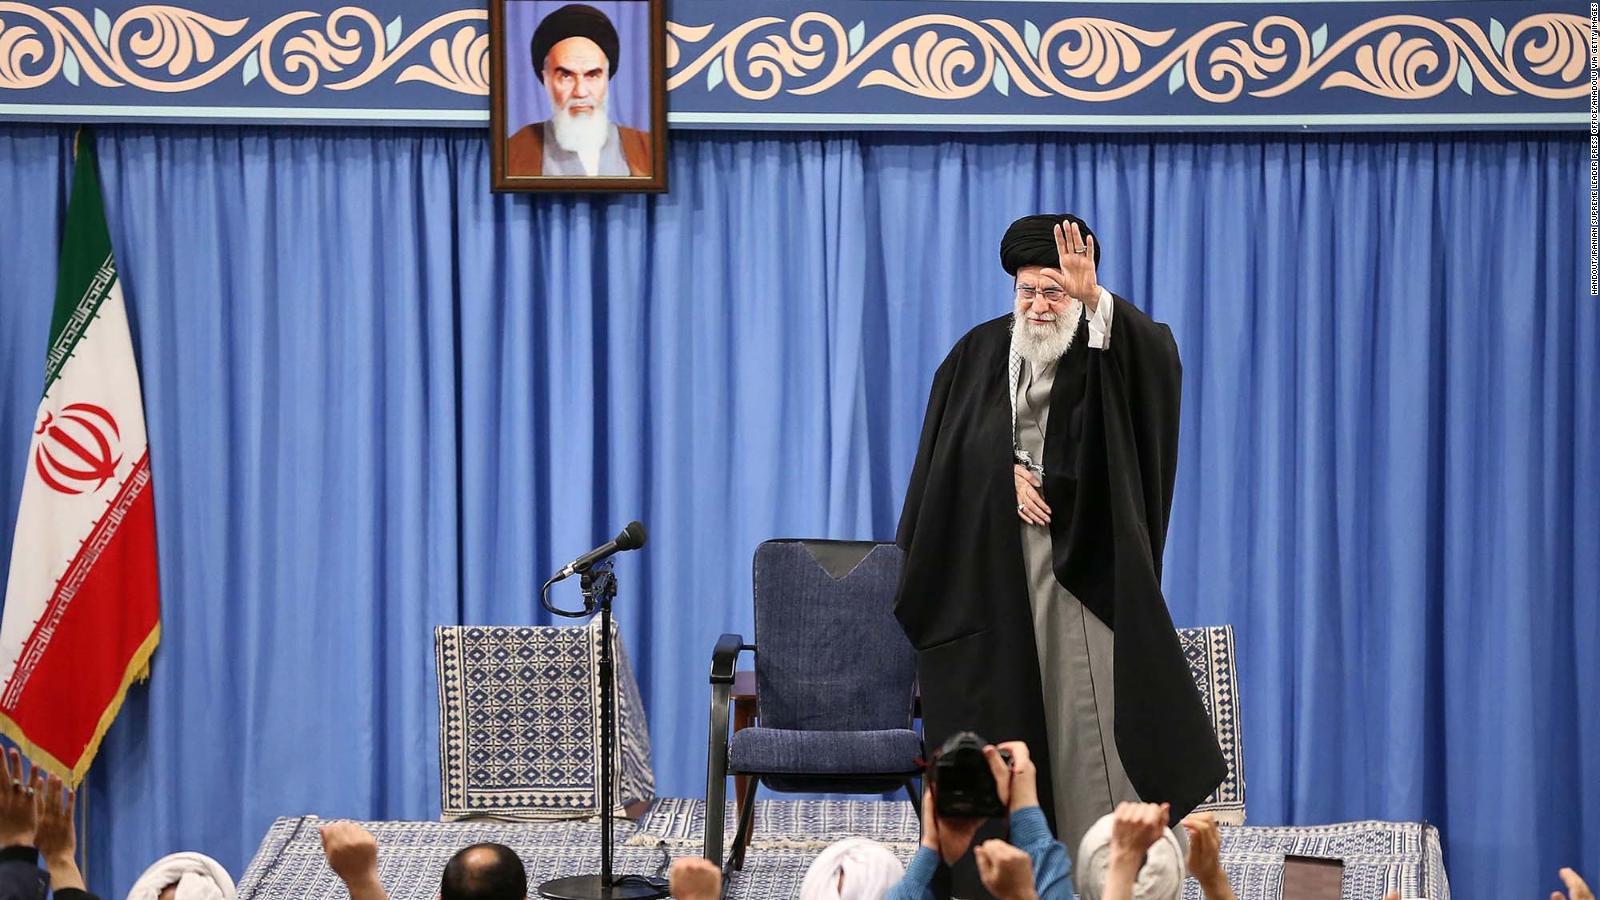 Alí Jamenei llama payaso al presidente Donald Trump